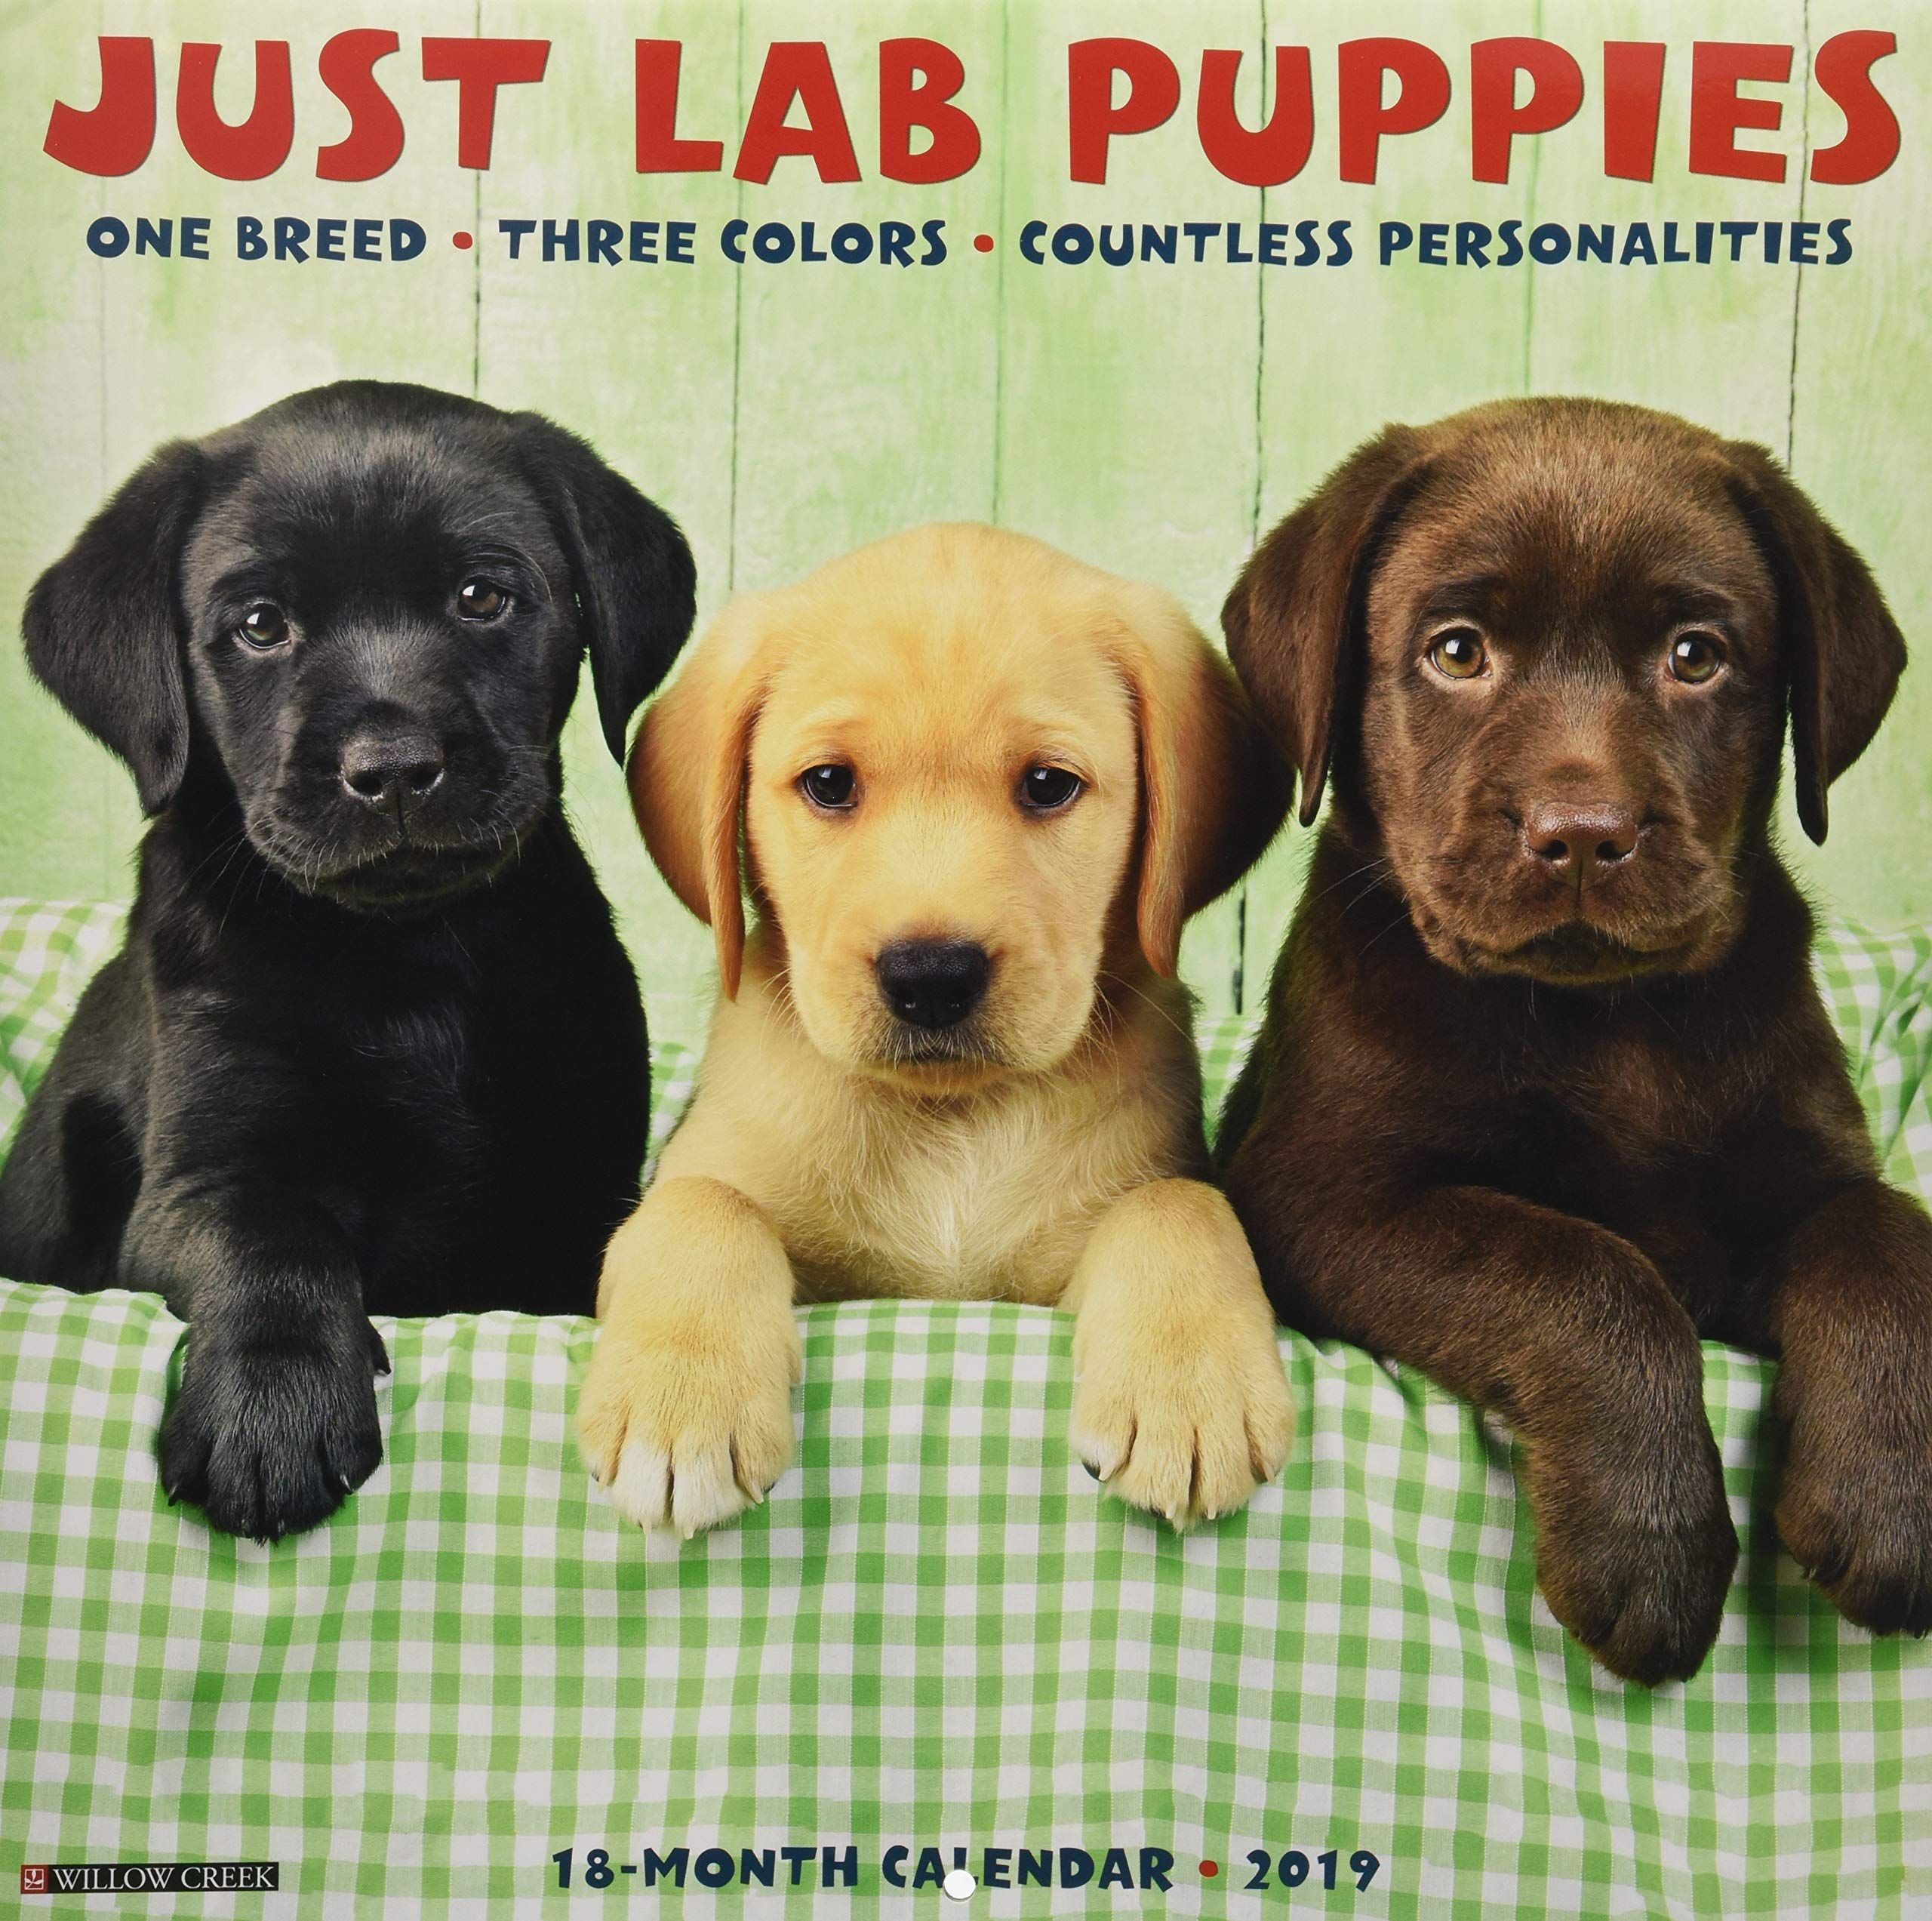 Just Lab Puppies 2019 Wall Calendar Dog Breed Calendar Calendar Wall Calendar July 15 2018 Wall Calendar Lab Puppie Lab Puppies Puppies Dog Breeds